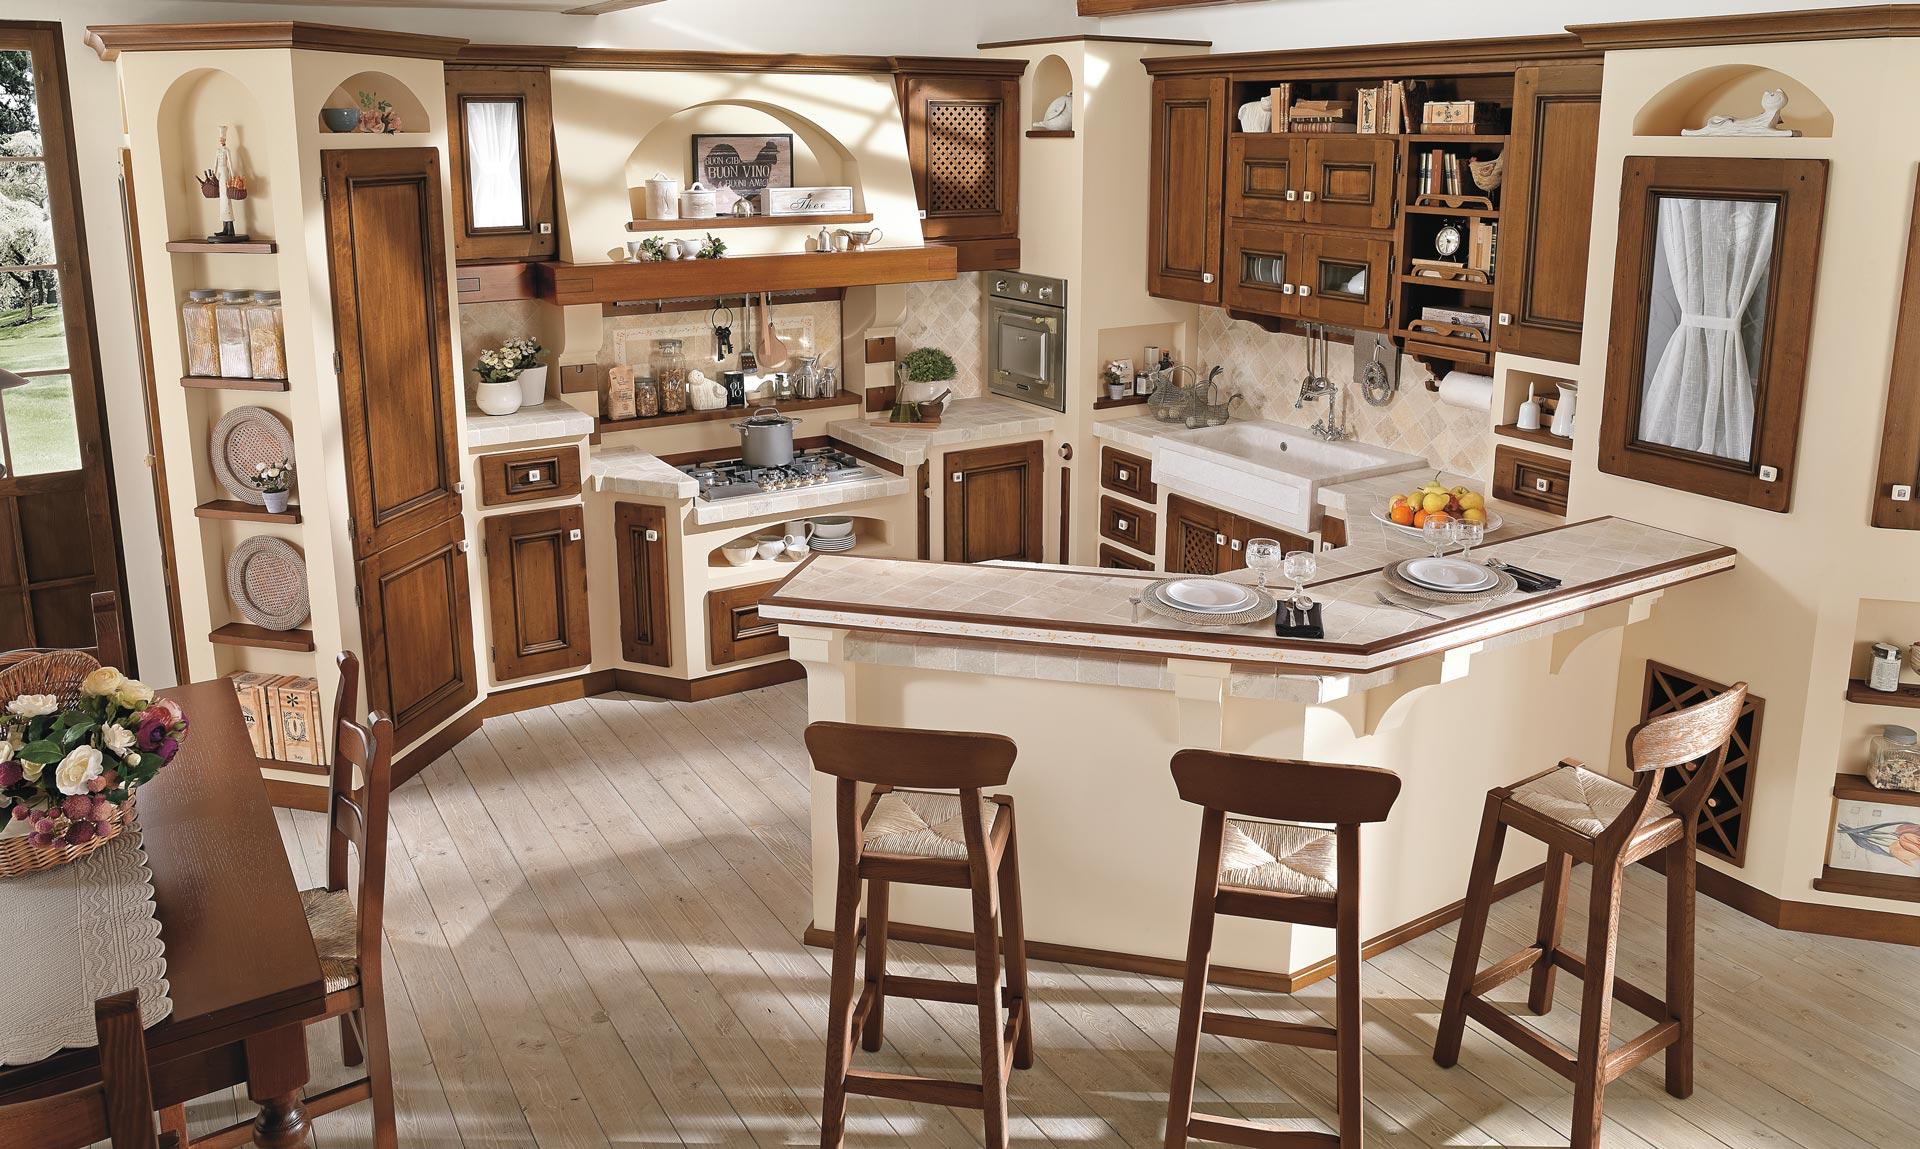 Stunning Cucine Antiche In Muratura Images - Home Design ...